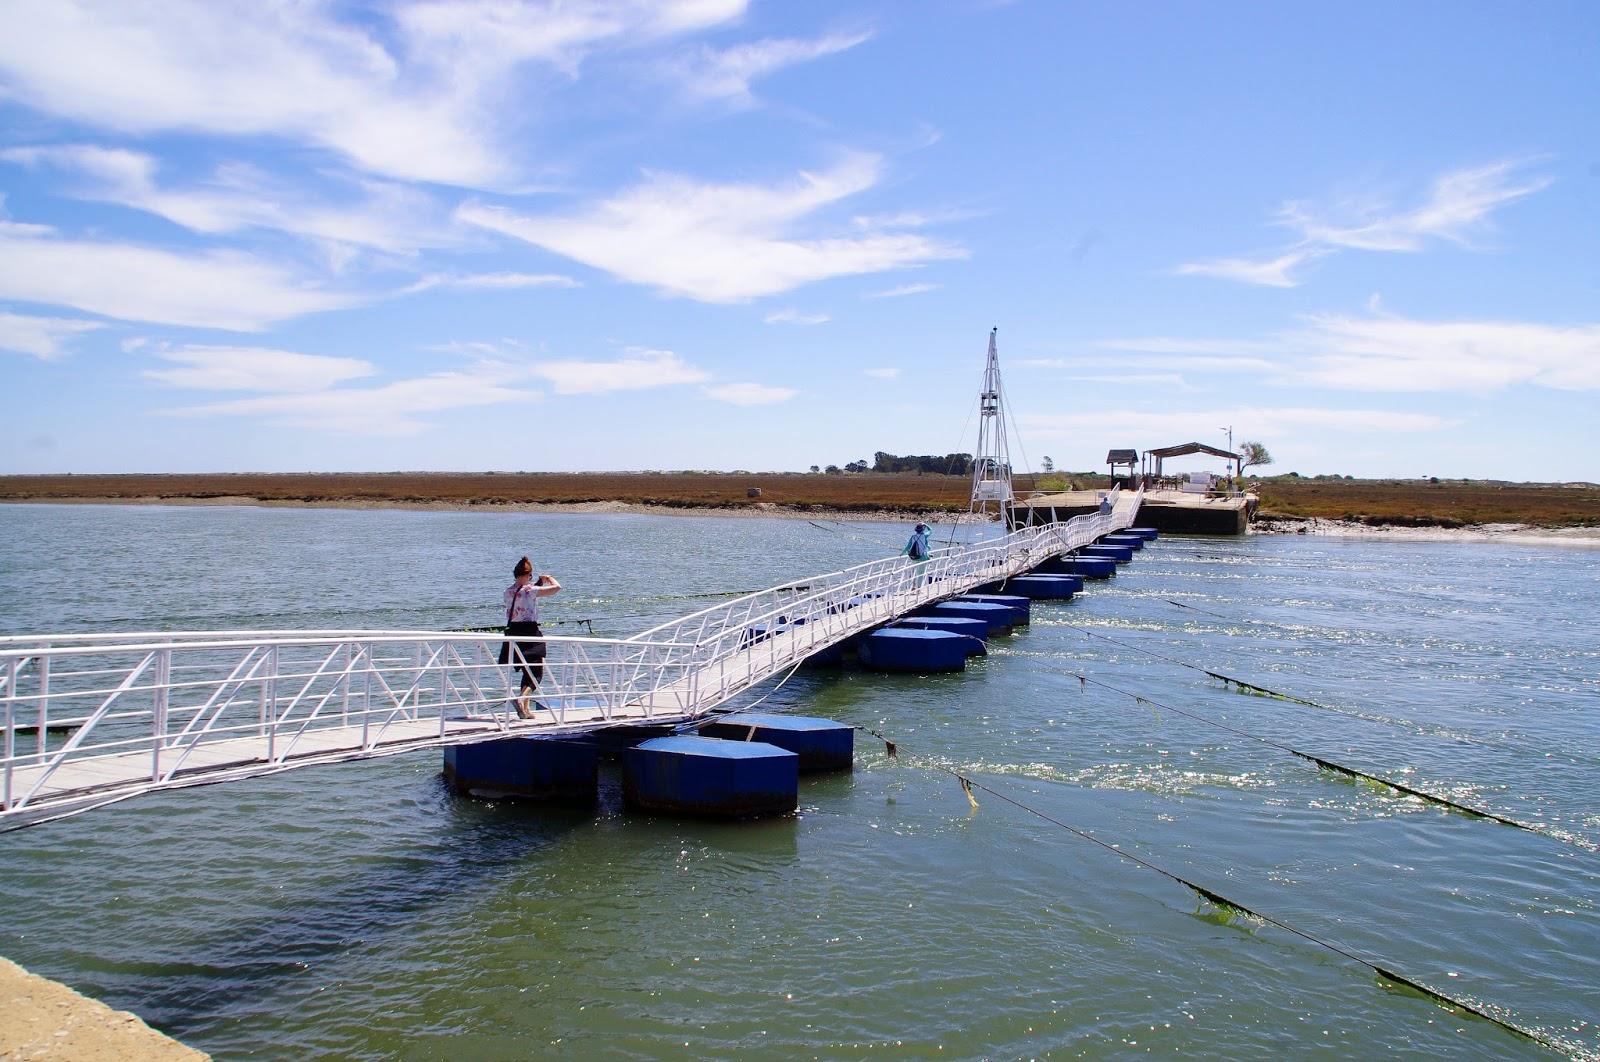 Bridge across Ria Formosa